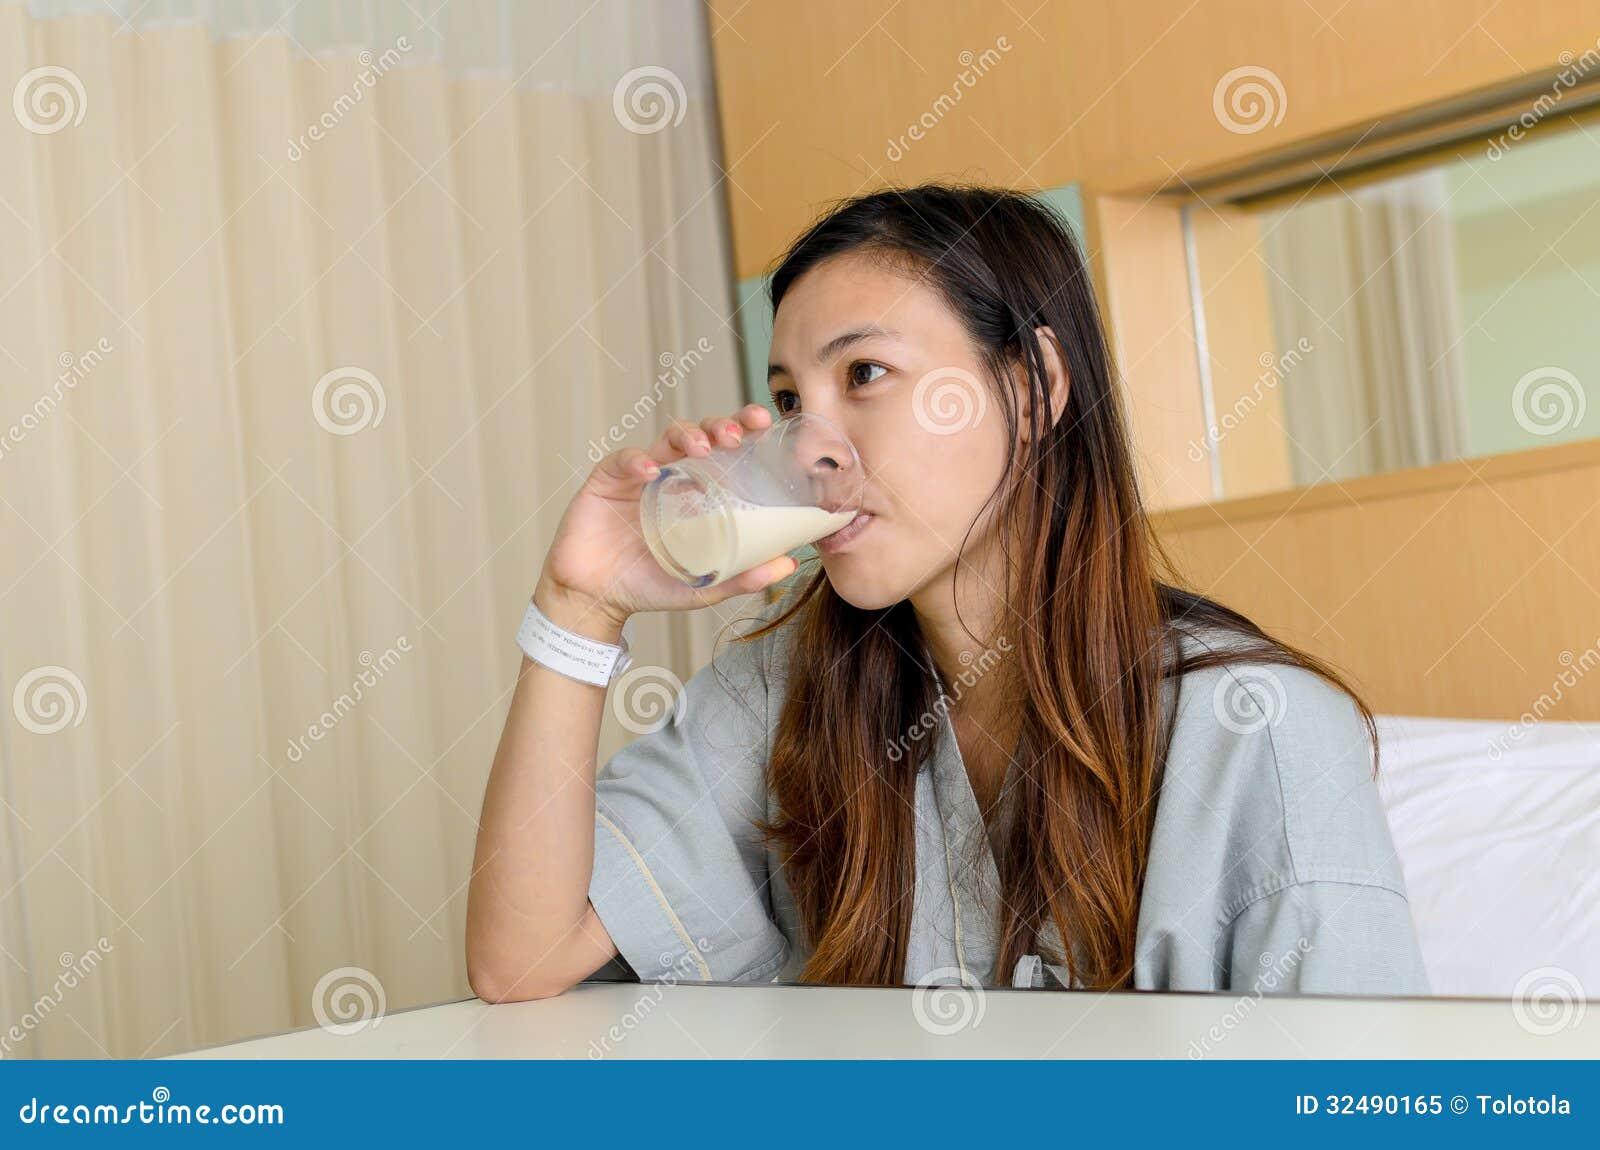 Lady Free Drinks Fling